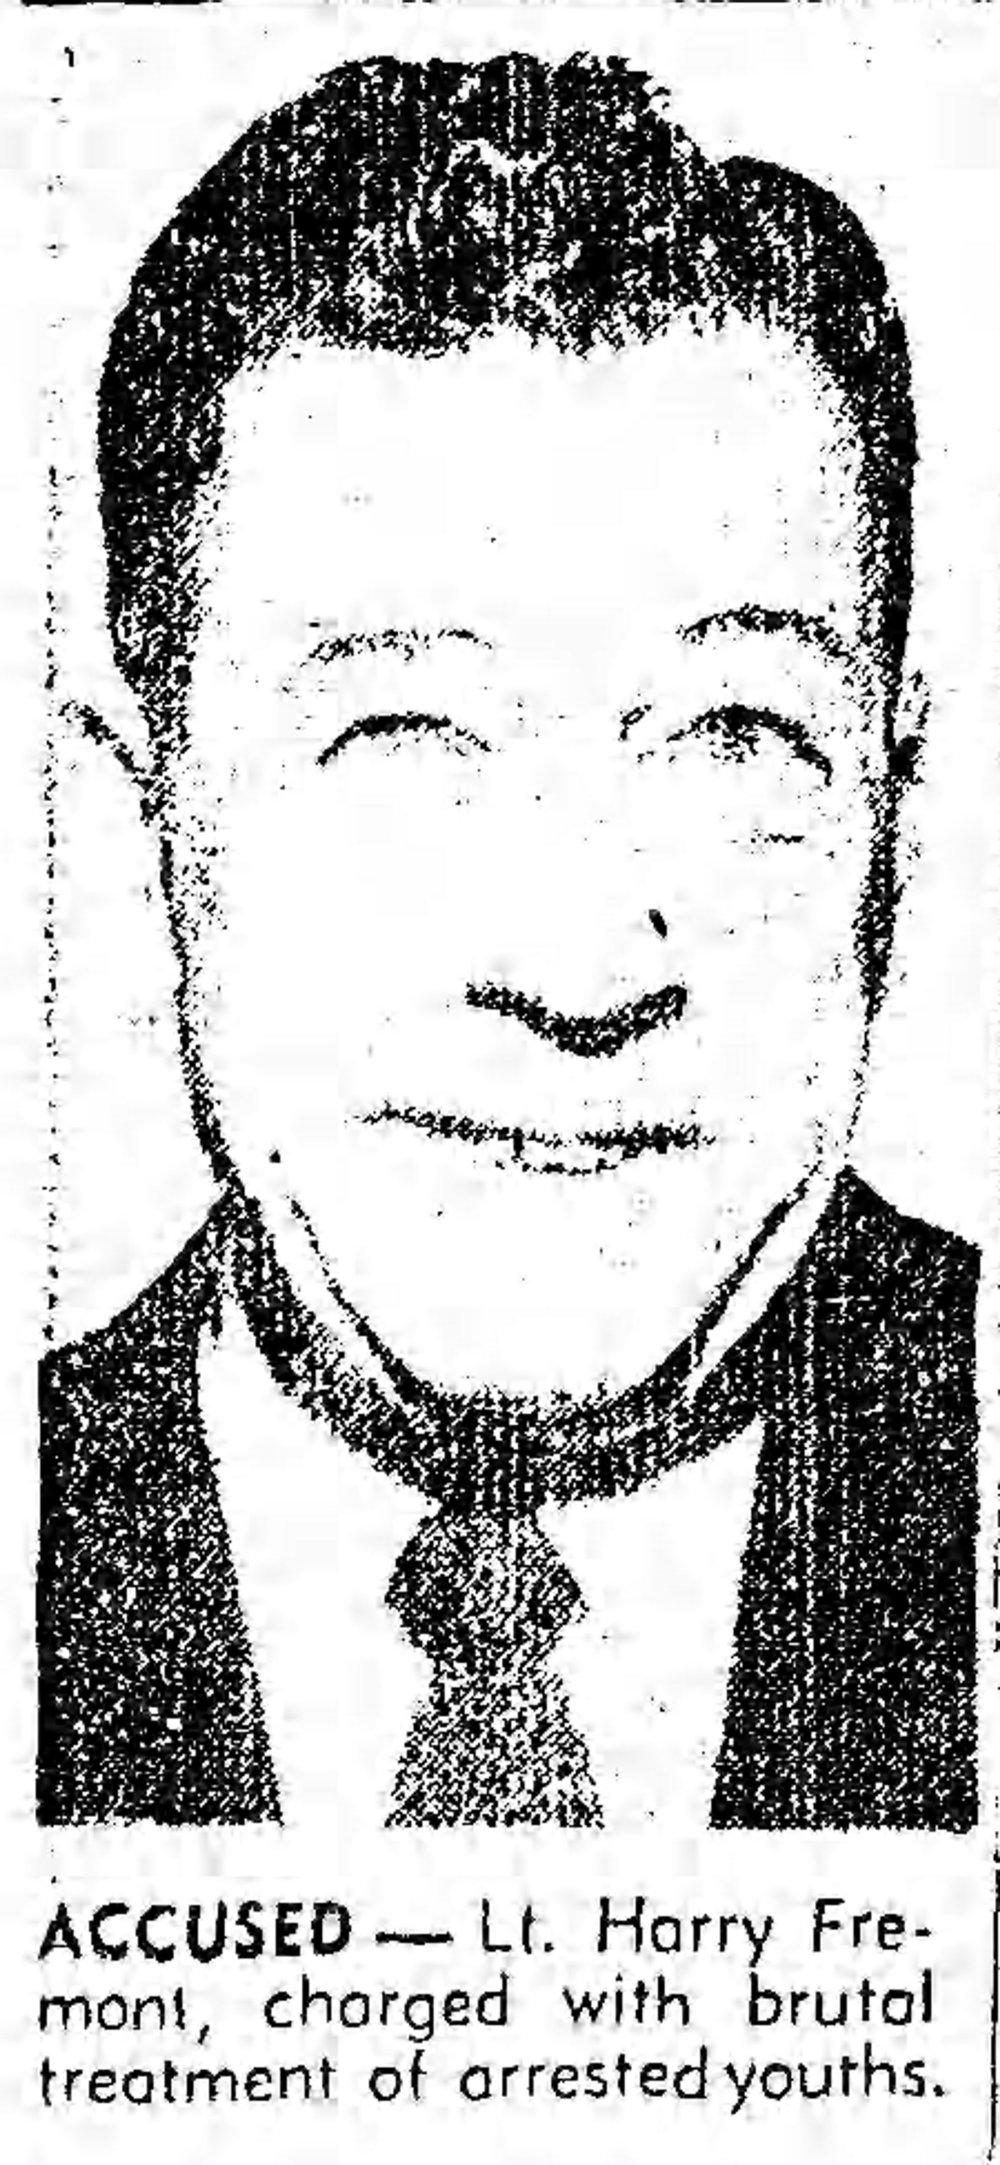 The_Los_Angeles_Times_Wed__Apr_23__1952_(3).jpg